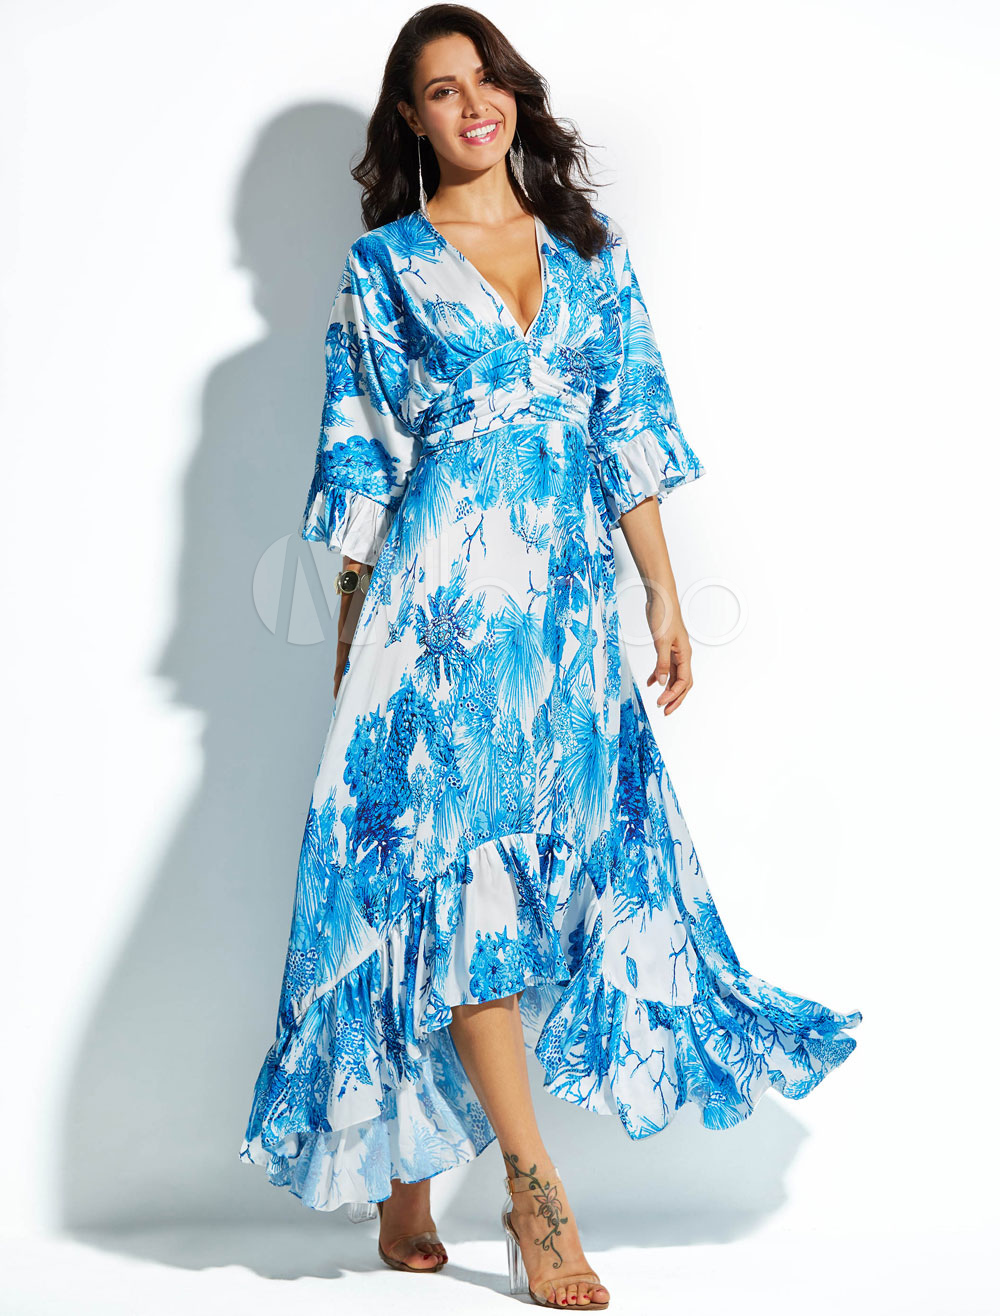 Buy Women Chiffon Dress Maxi V Neck Half Sleeve Floral Print Ruffle Asymmetrical Design Blue Boho Long Dress for $52.24 in Milanoo store